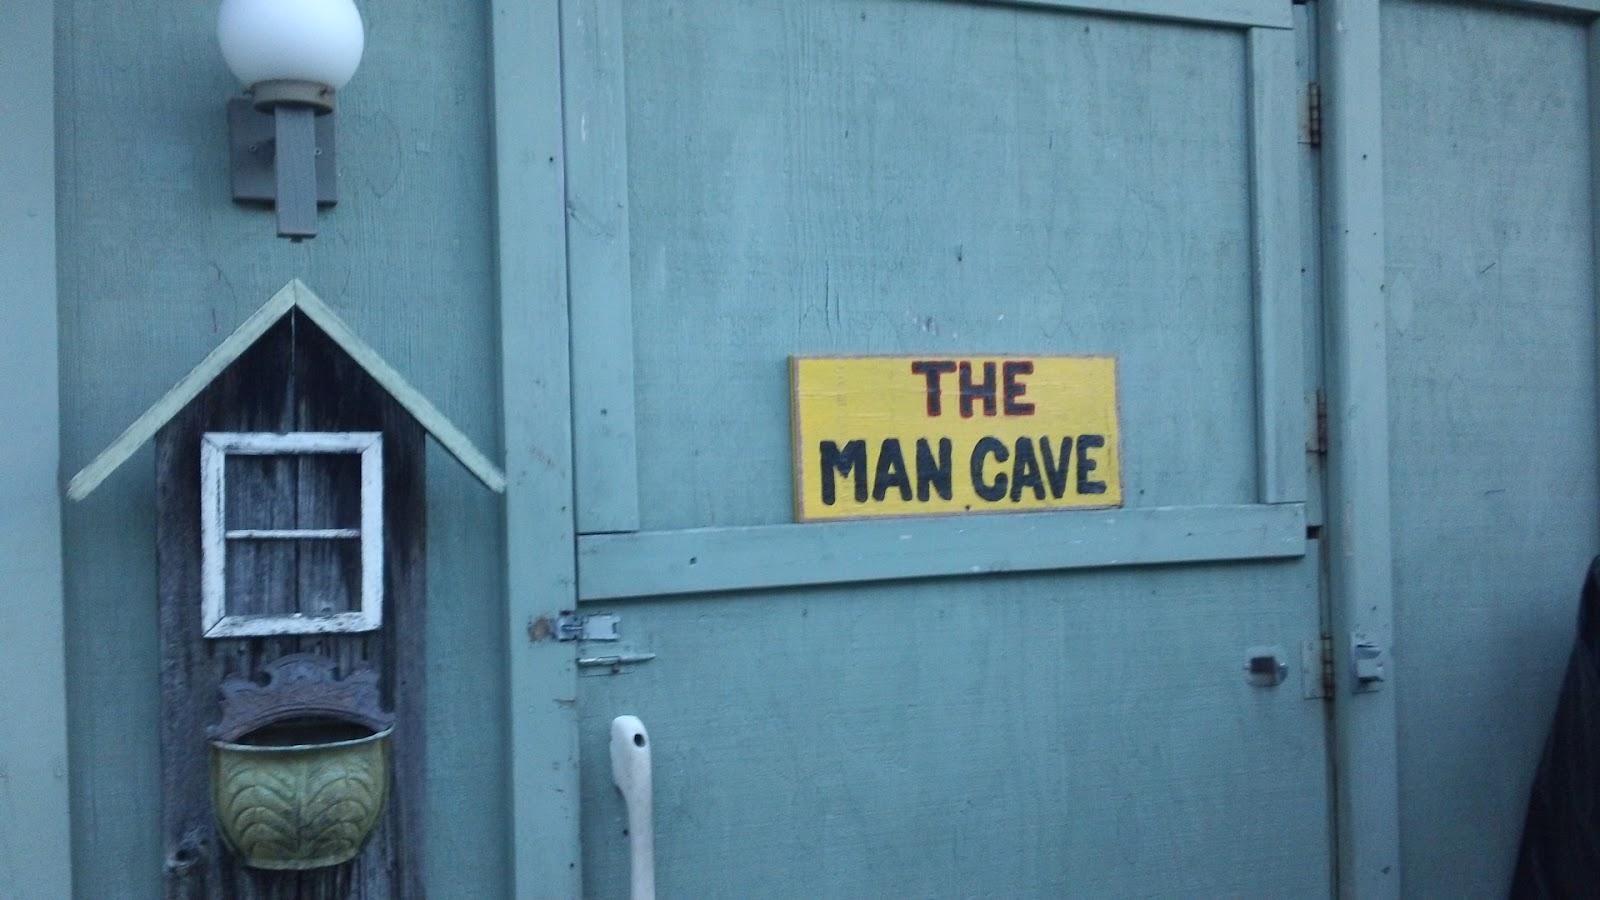 Man Cave Yard Sale Wv : The man cave garage sale